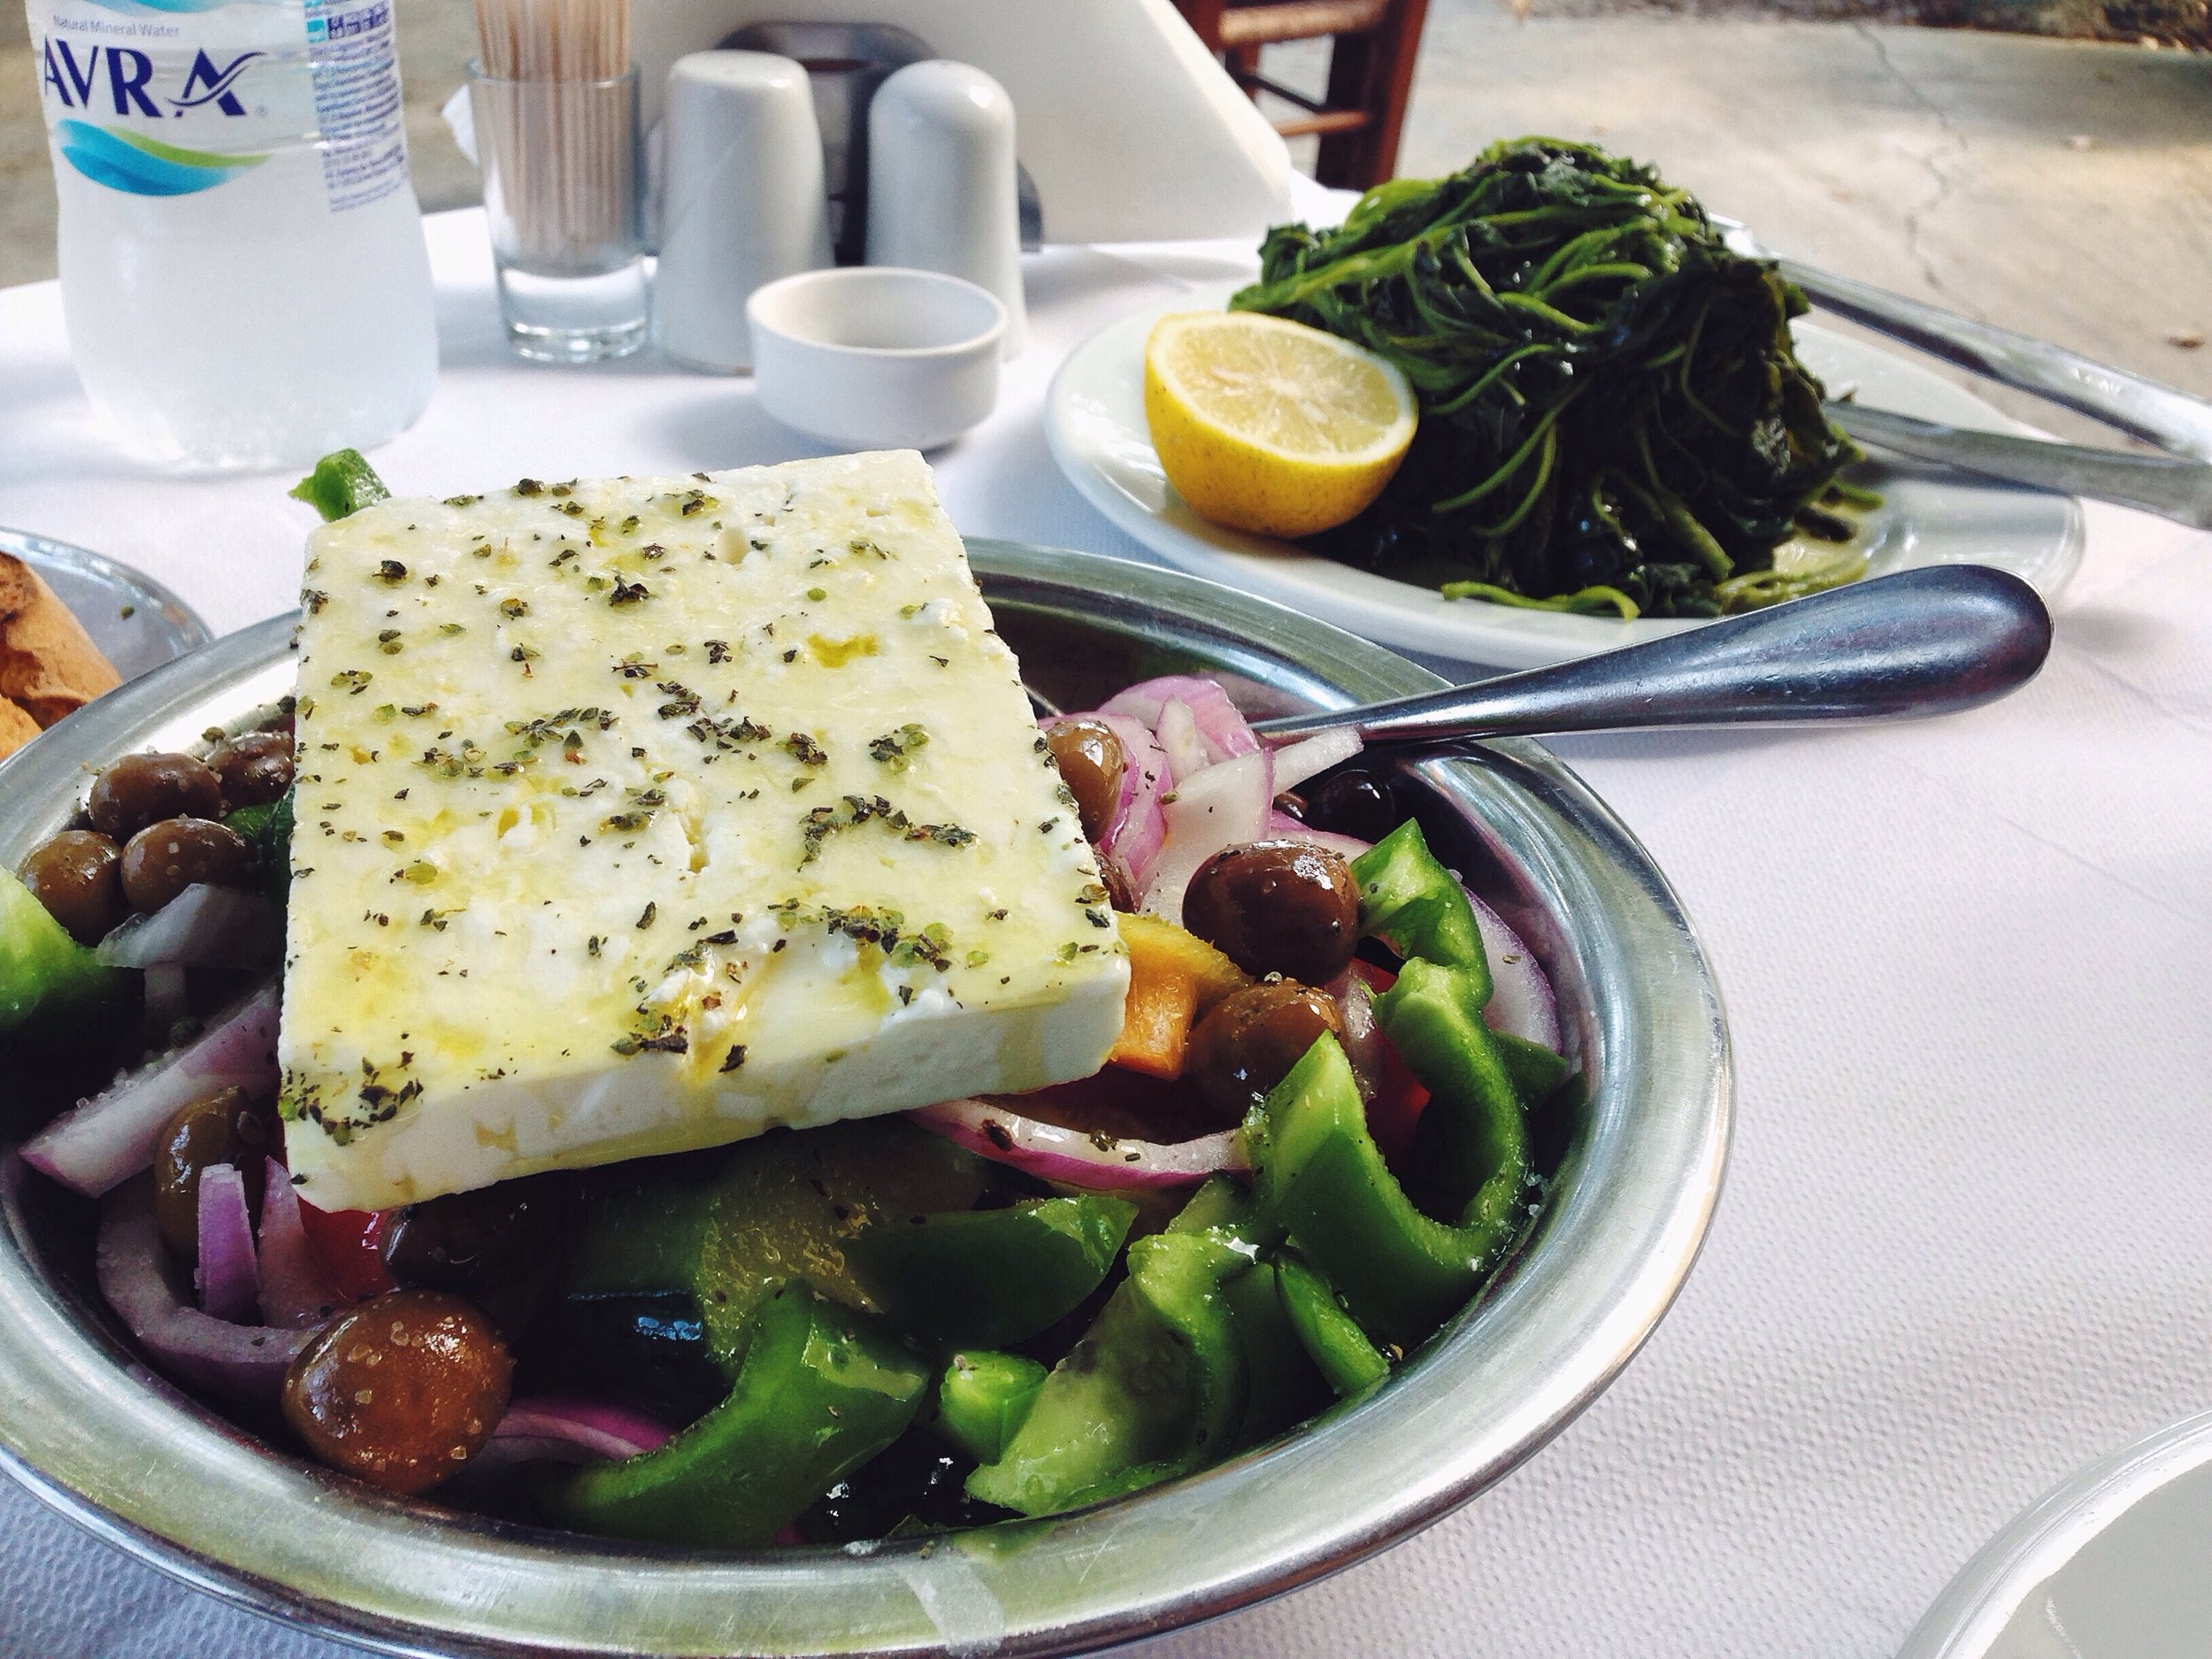 Feta cheese & fresh veggies - Greek staples modern & ancient! (Photo by Katherine Poseidon)